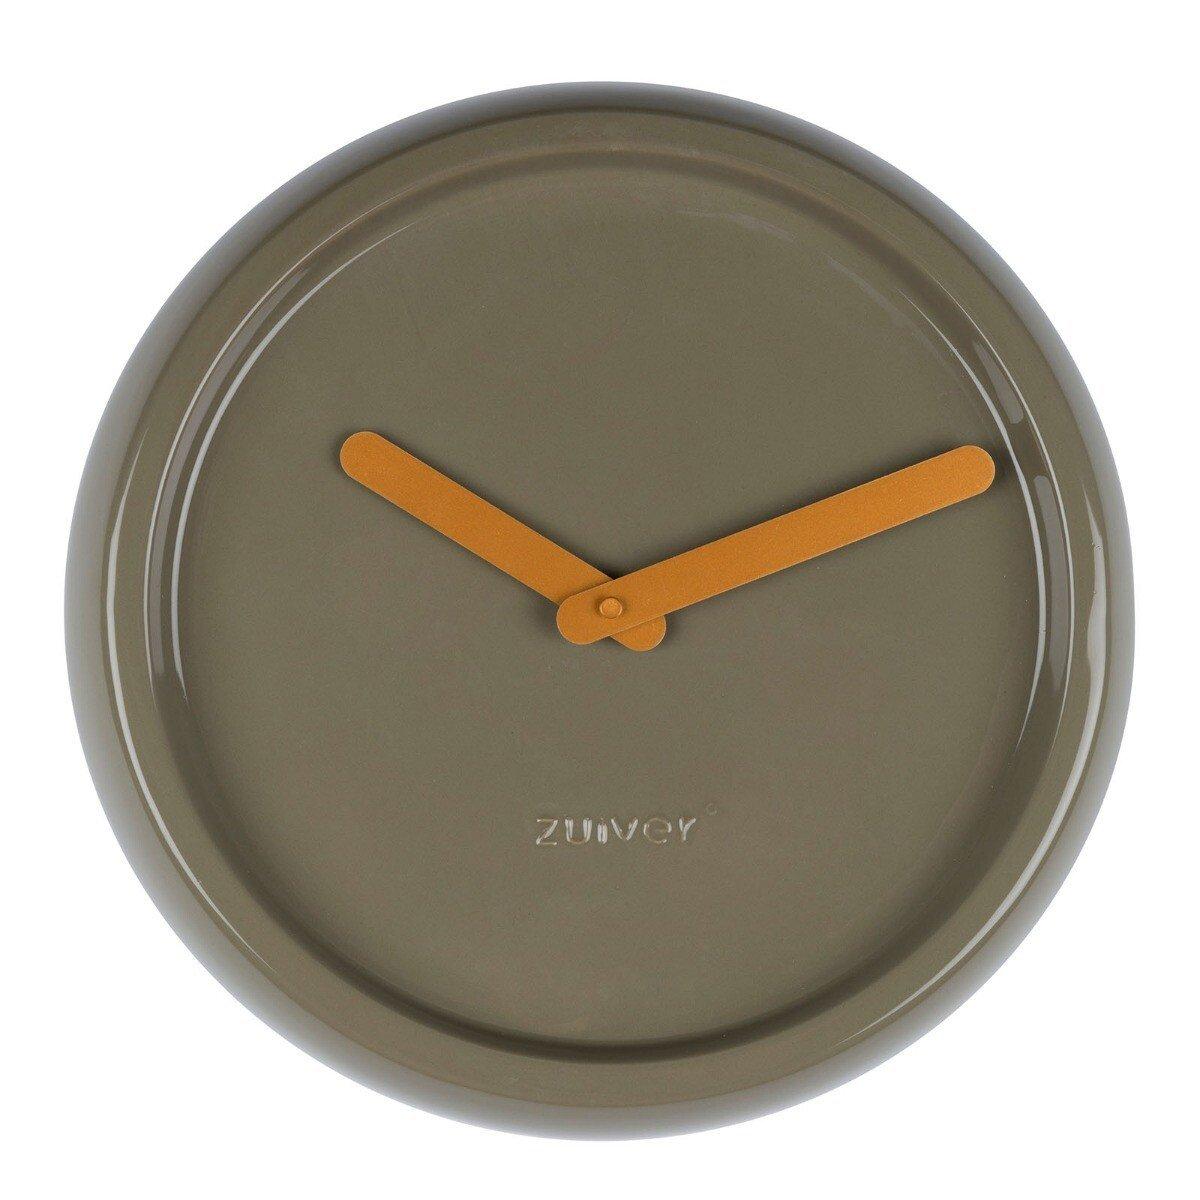 Zuiver Ceramic Time Wandklok Groen